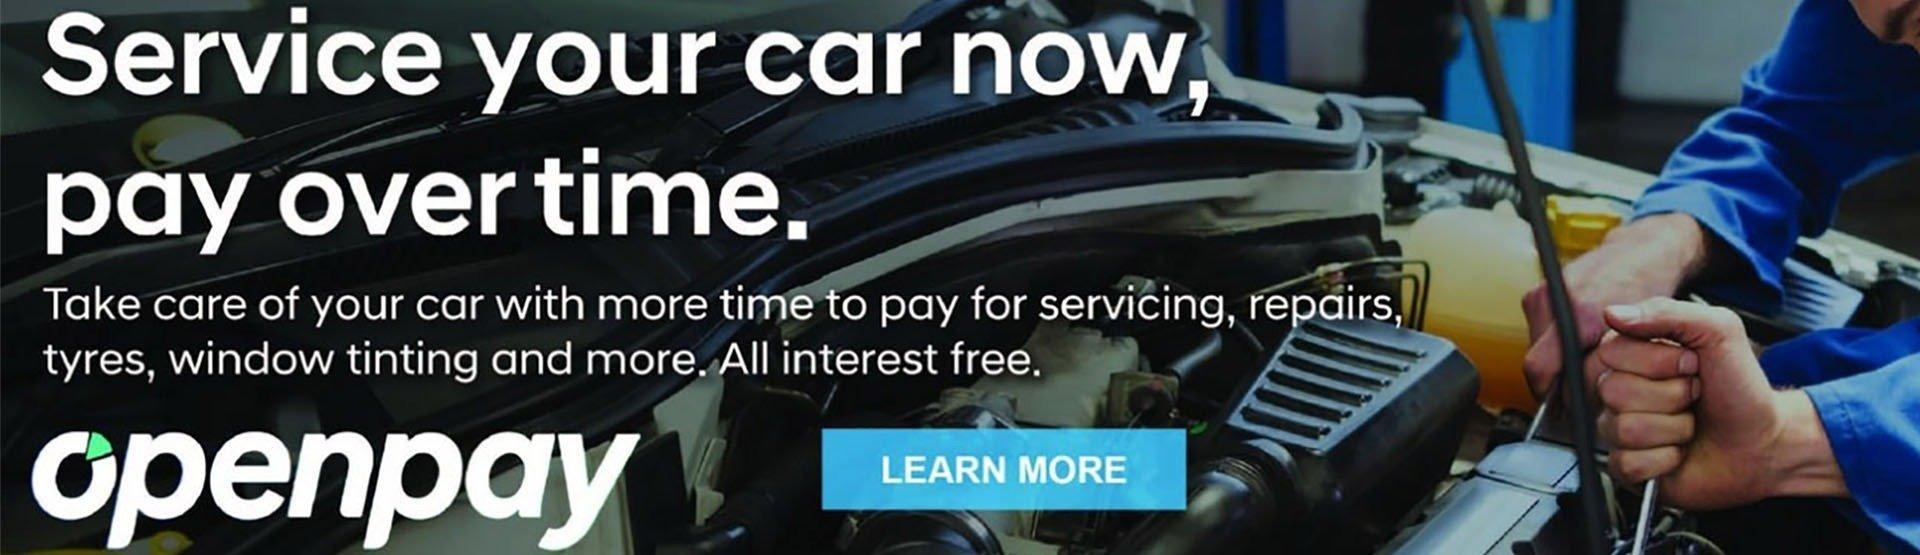 FTG Nissan service